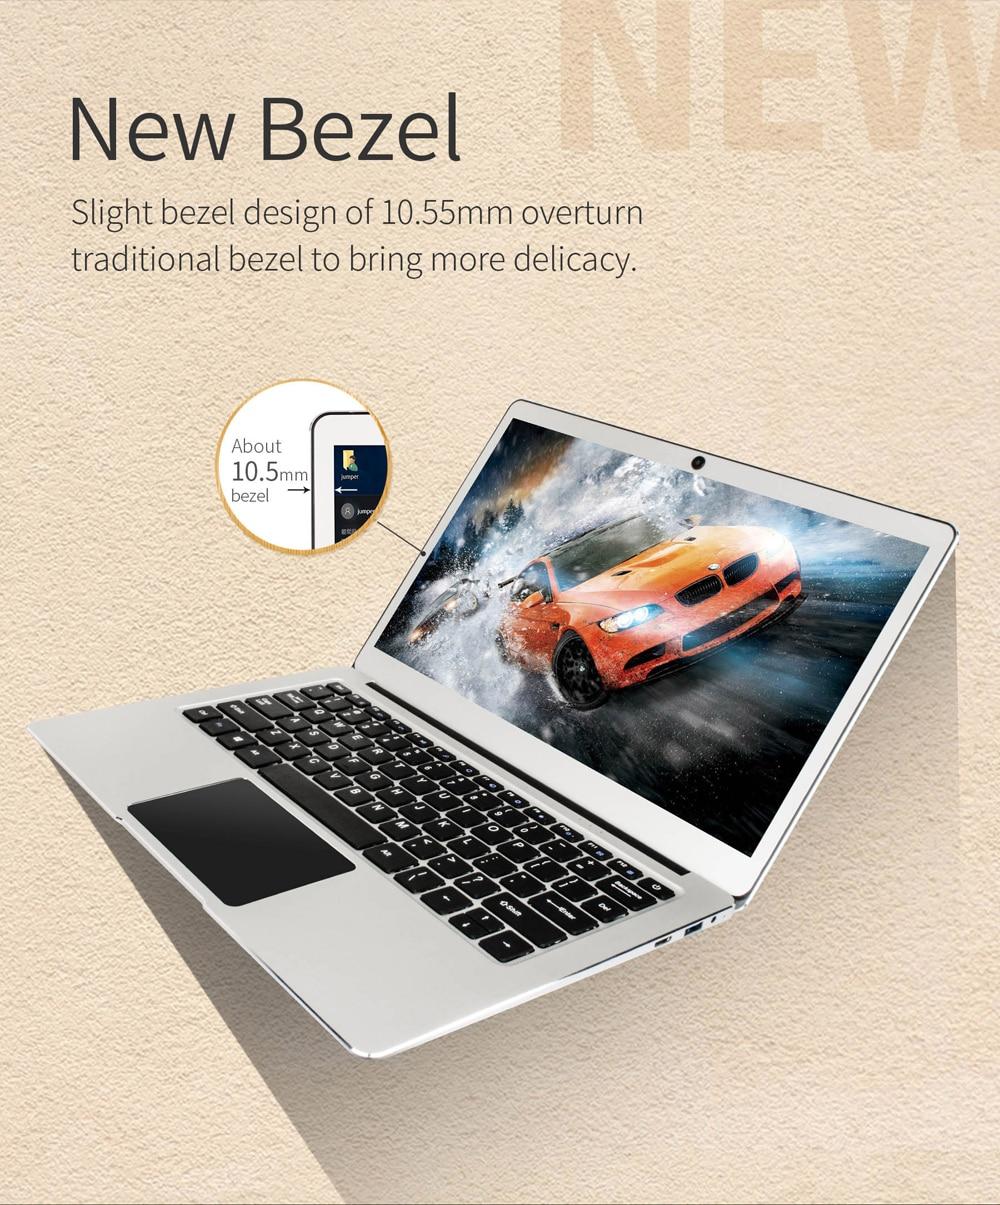 Jumper Ezbook 3 Pro Laptop 13.3 Inch Ips Scherm Intel J3455 6 Gb + 64 Gb Notebook 2.4G/ 5G Wifi Met M.2 Sata Ssd Slot